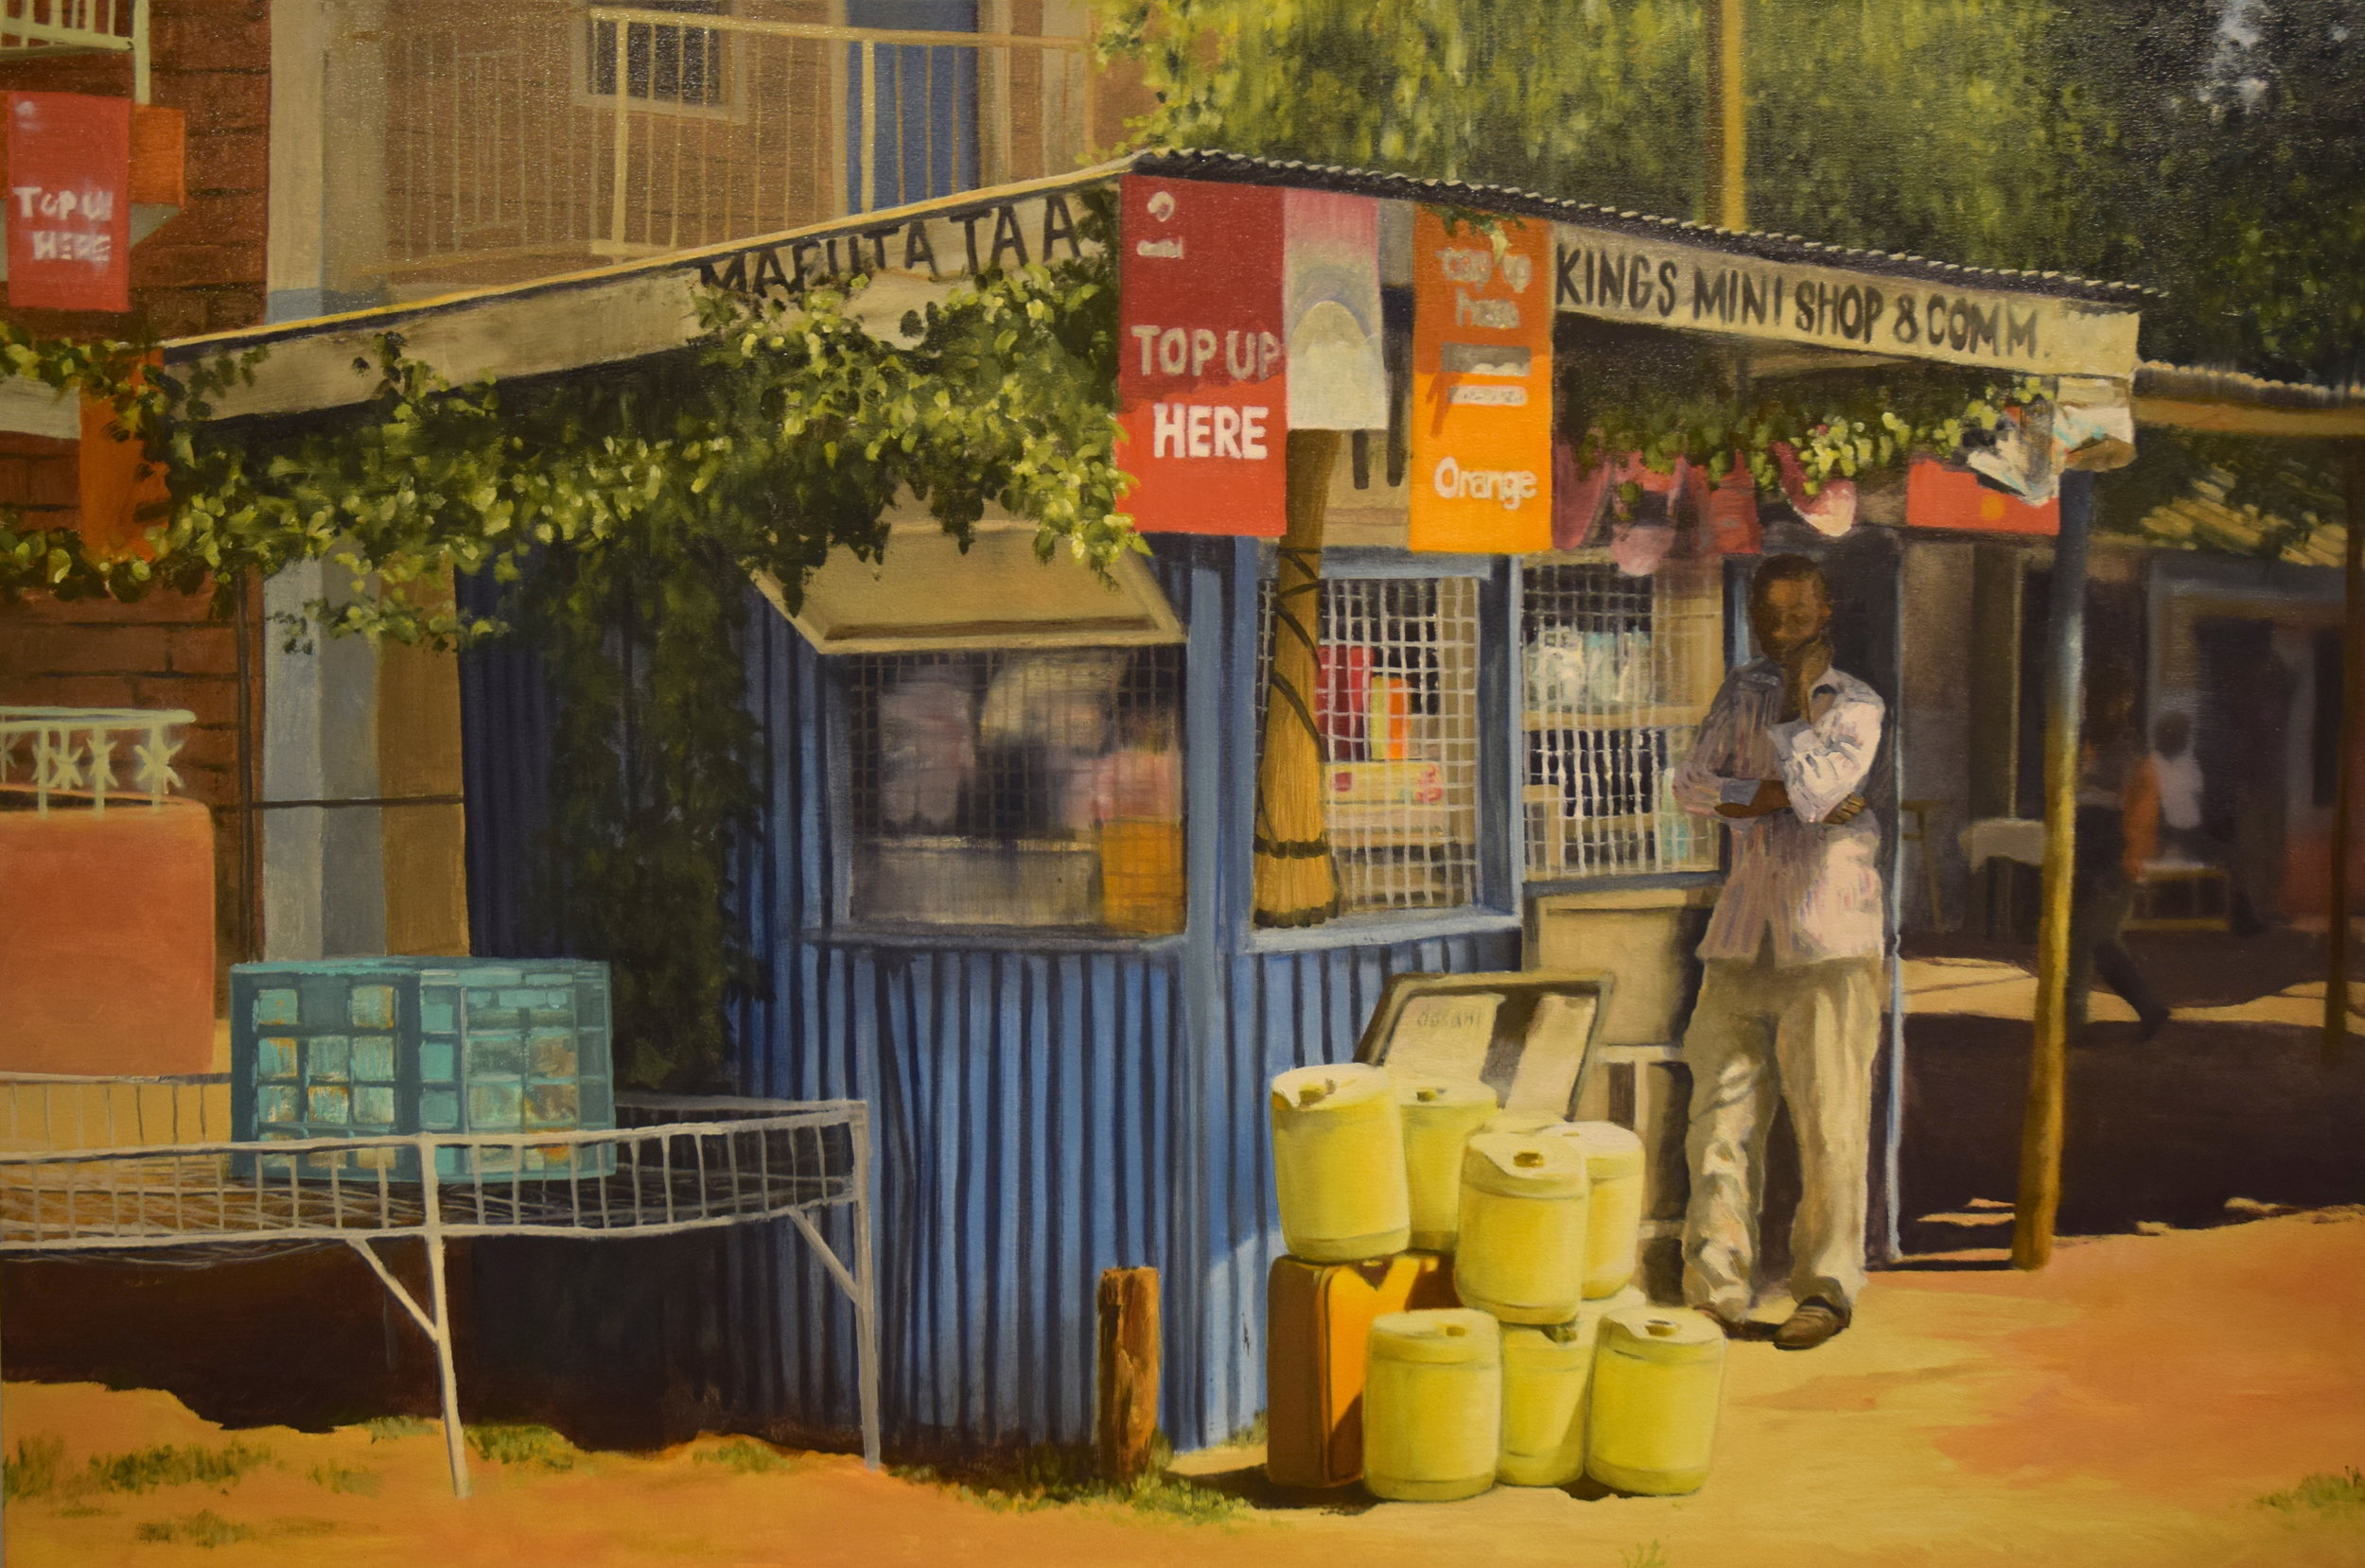 "King's Mini Shop, 2016, oil on canvas, 30"" x 45"""